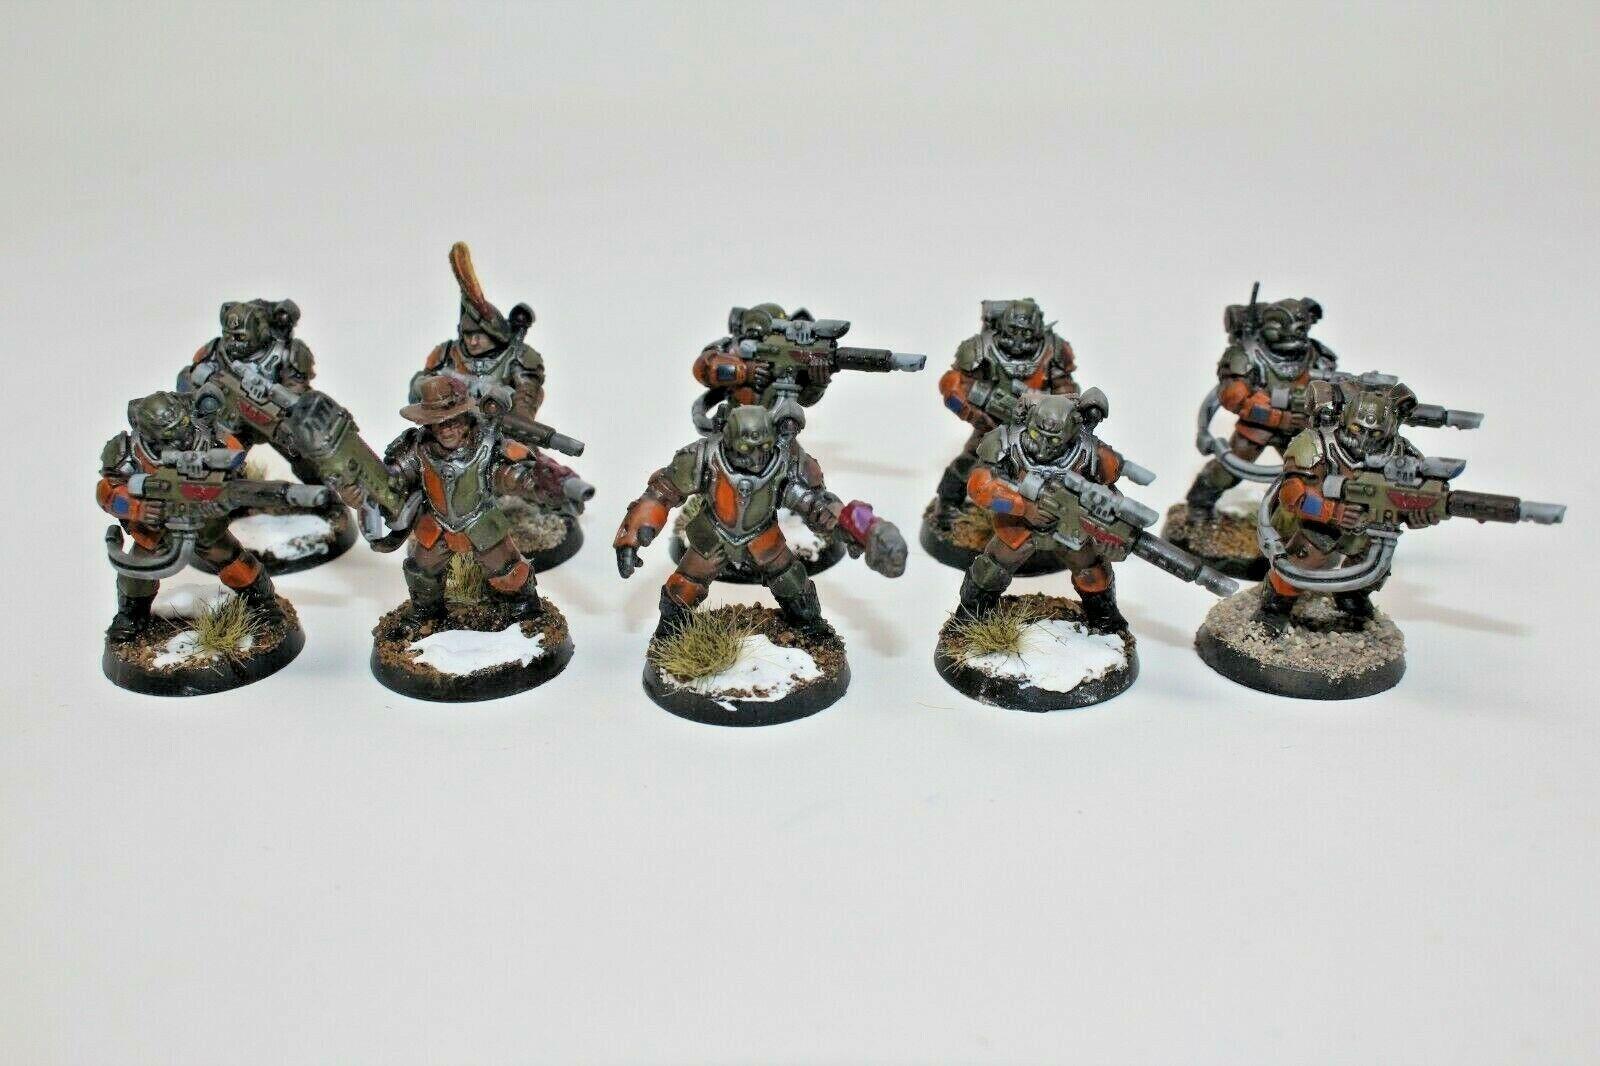 Warhammer Inperial Guardia scions bien pintado personalizado-JYS4